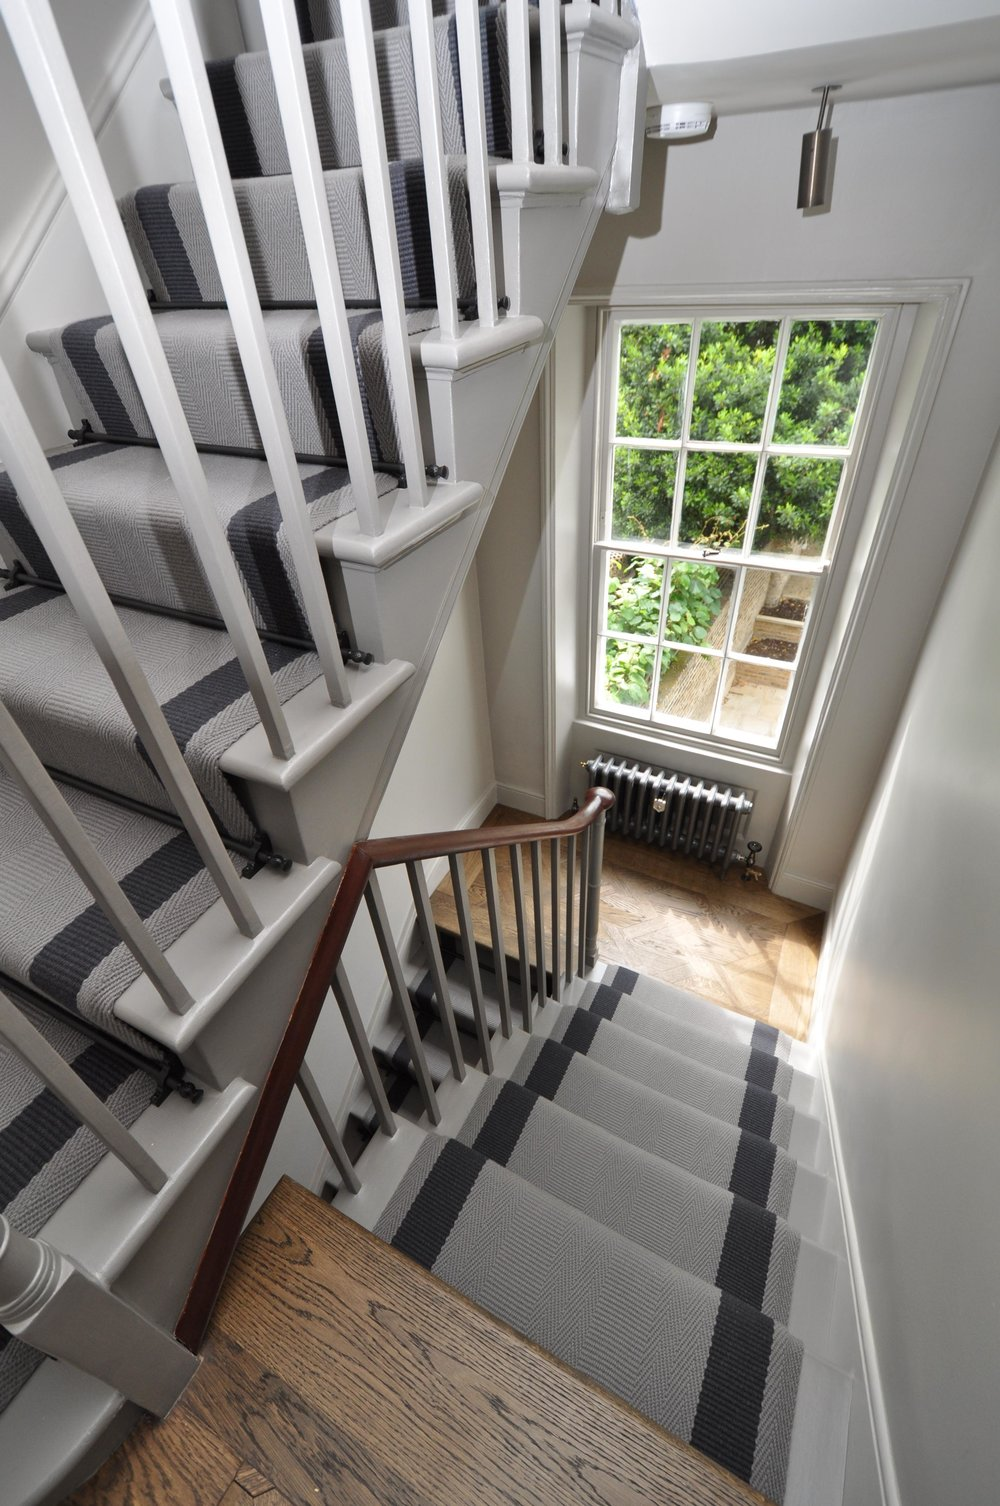 flatweave-stair-runner-london-bowloom-off-the-loom-geometric-carpet-DSC_1126.jpg